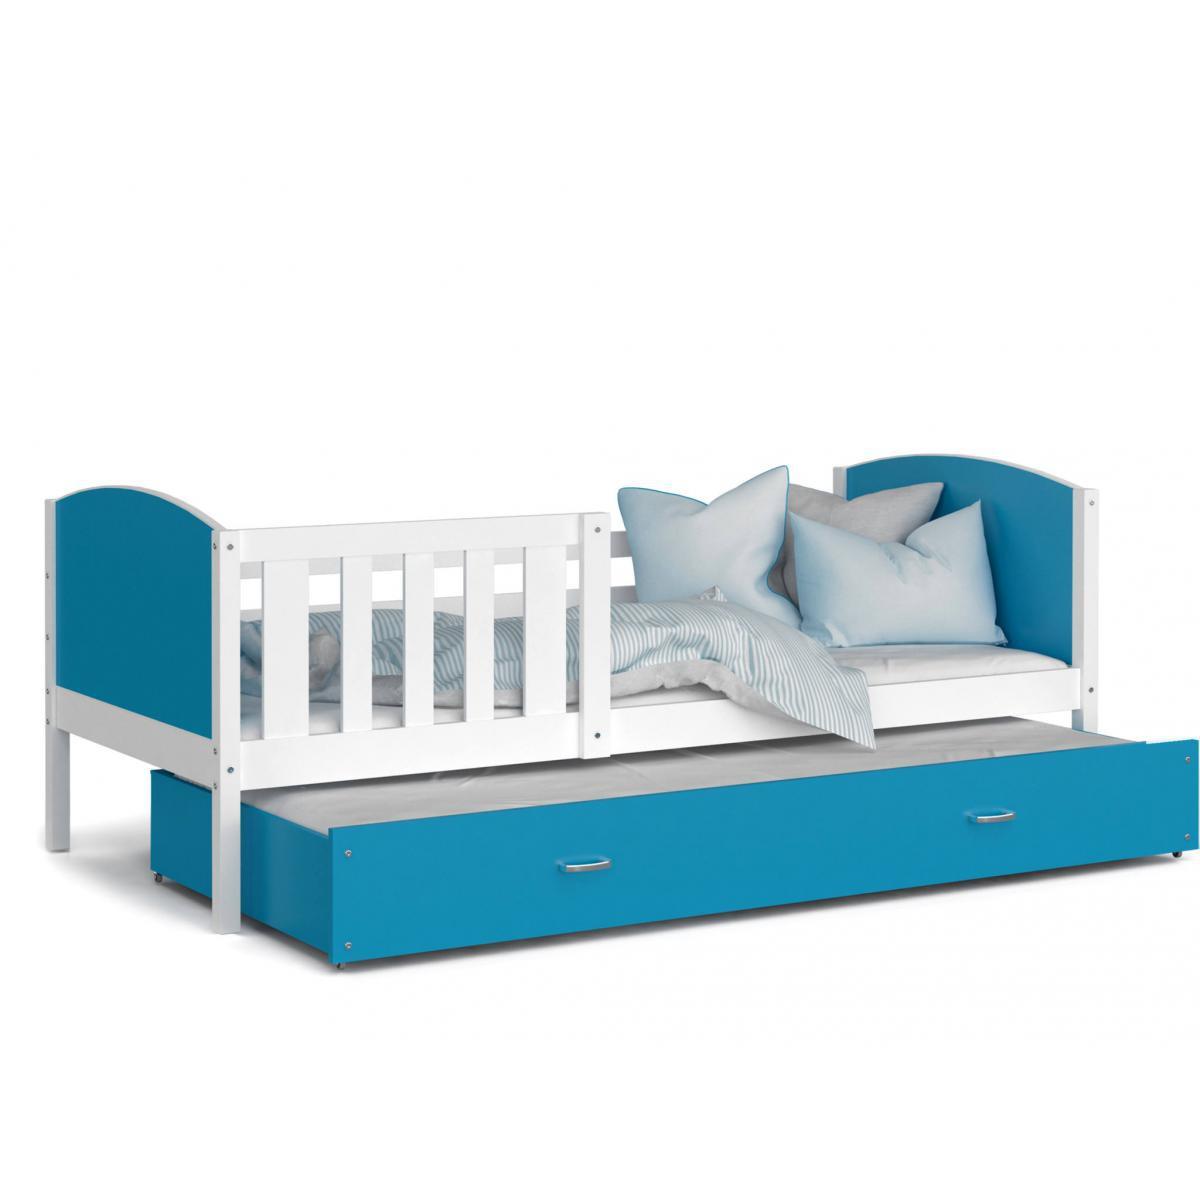 Kids Literie LIT Gigogne Tomy 90x190 Blanc - Bleu livré avec sommier, tiroir et matelas de 7cm OFFERT.